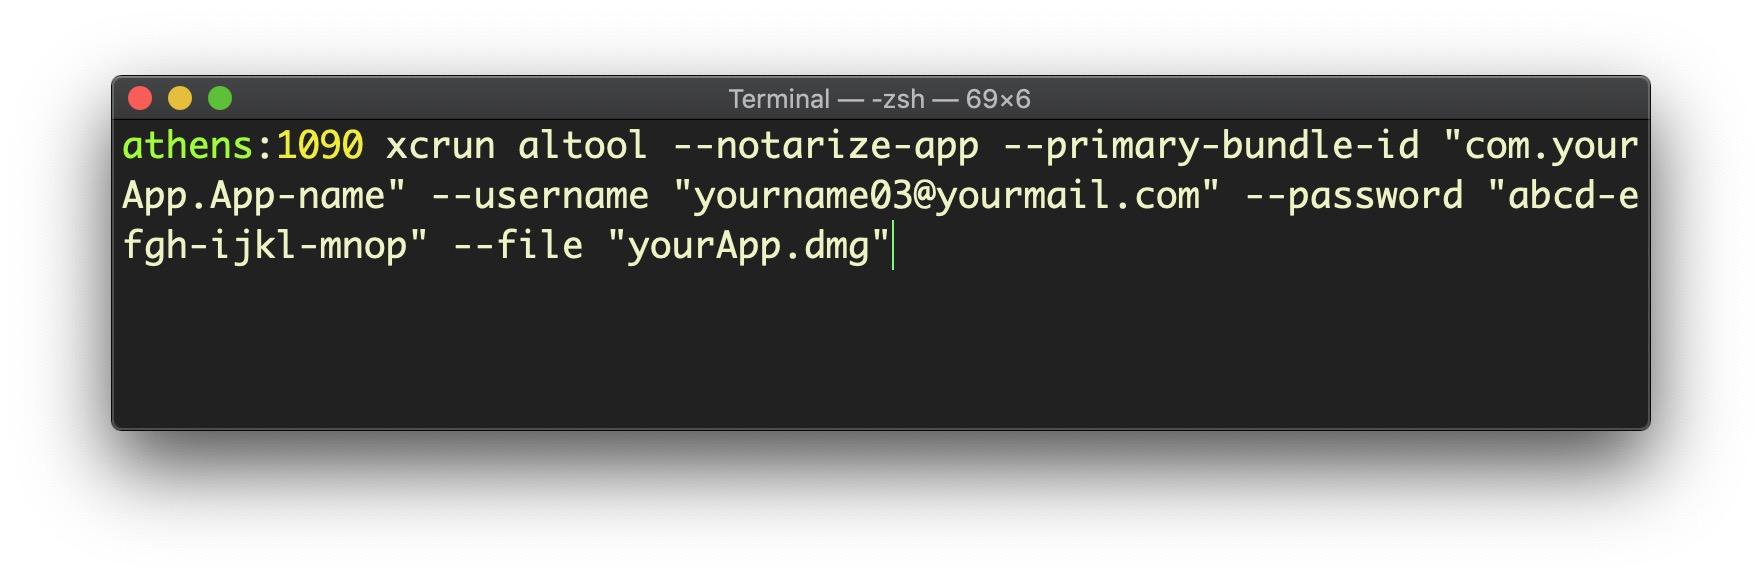 image of notarizing an app